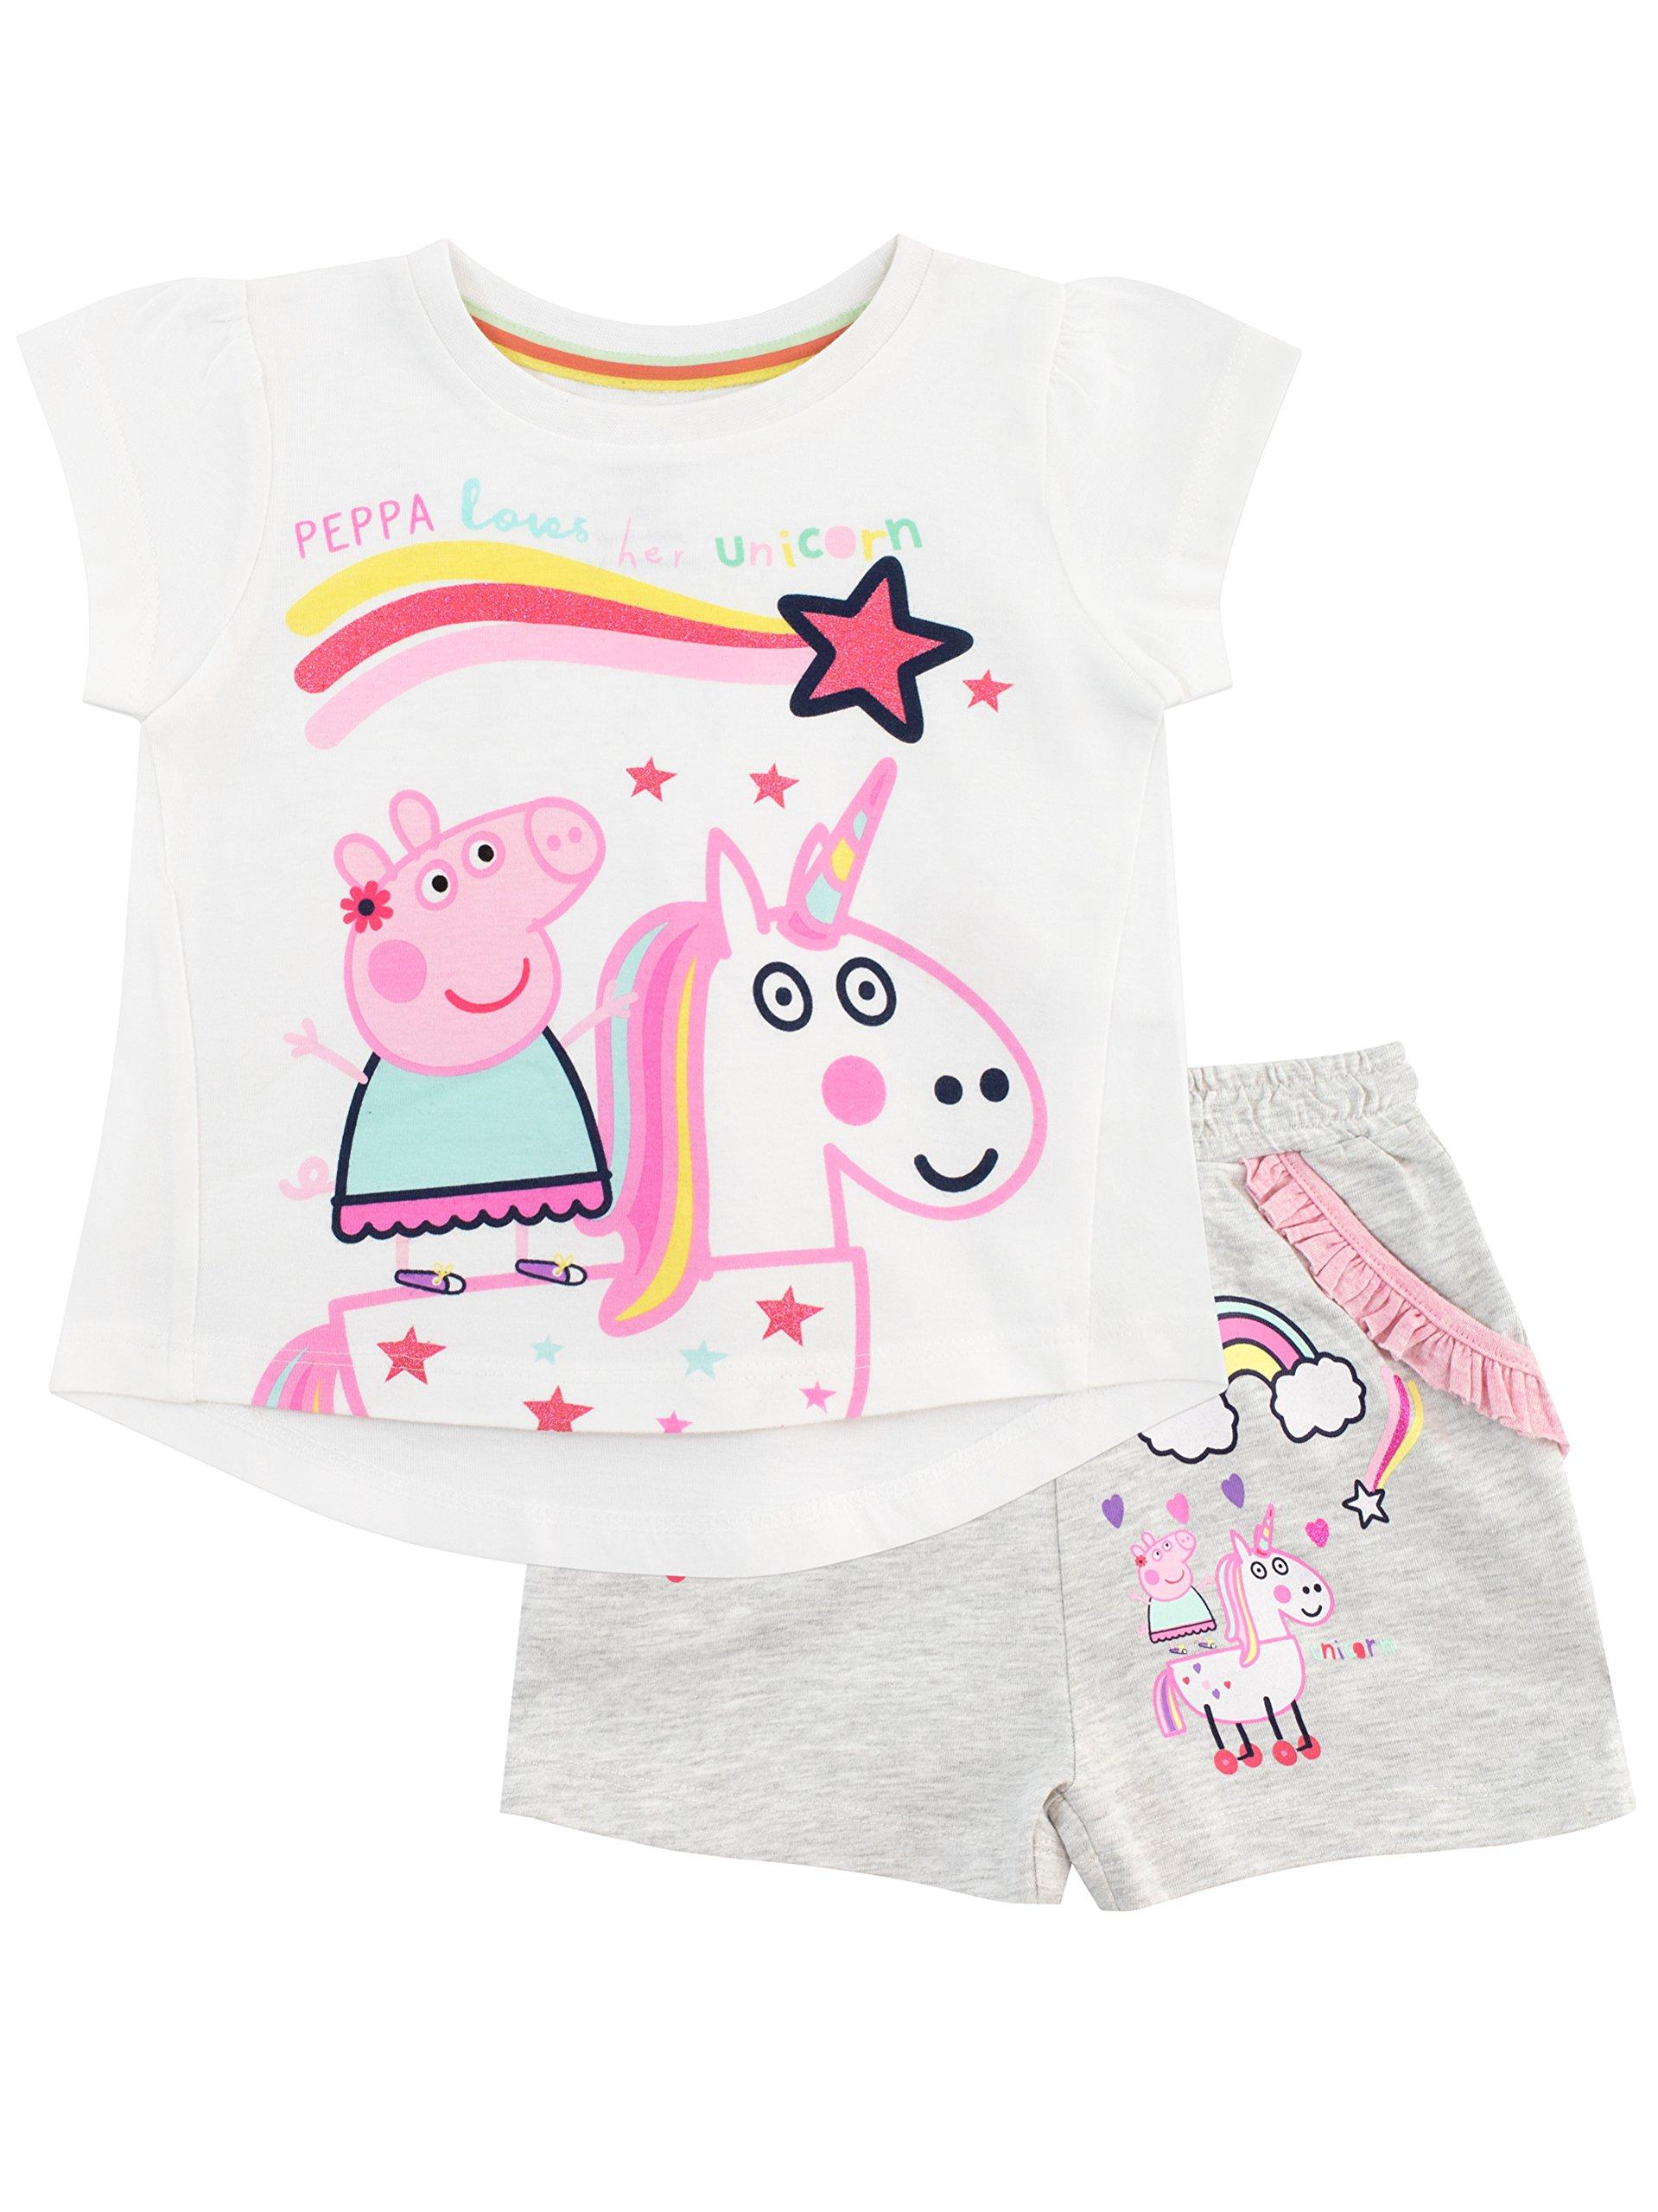 Peppa Pig Girls' Unicorn Top and Shorts Set Size 4 Multicolored